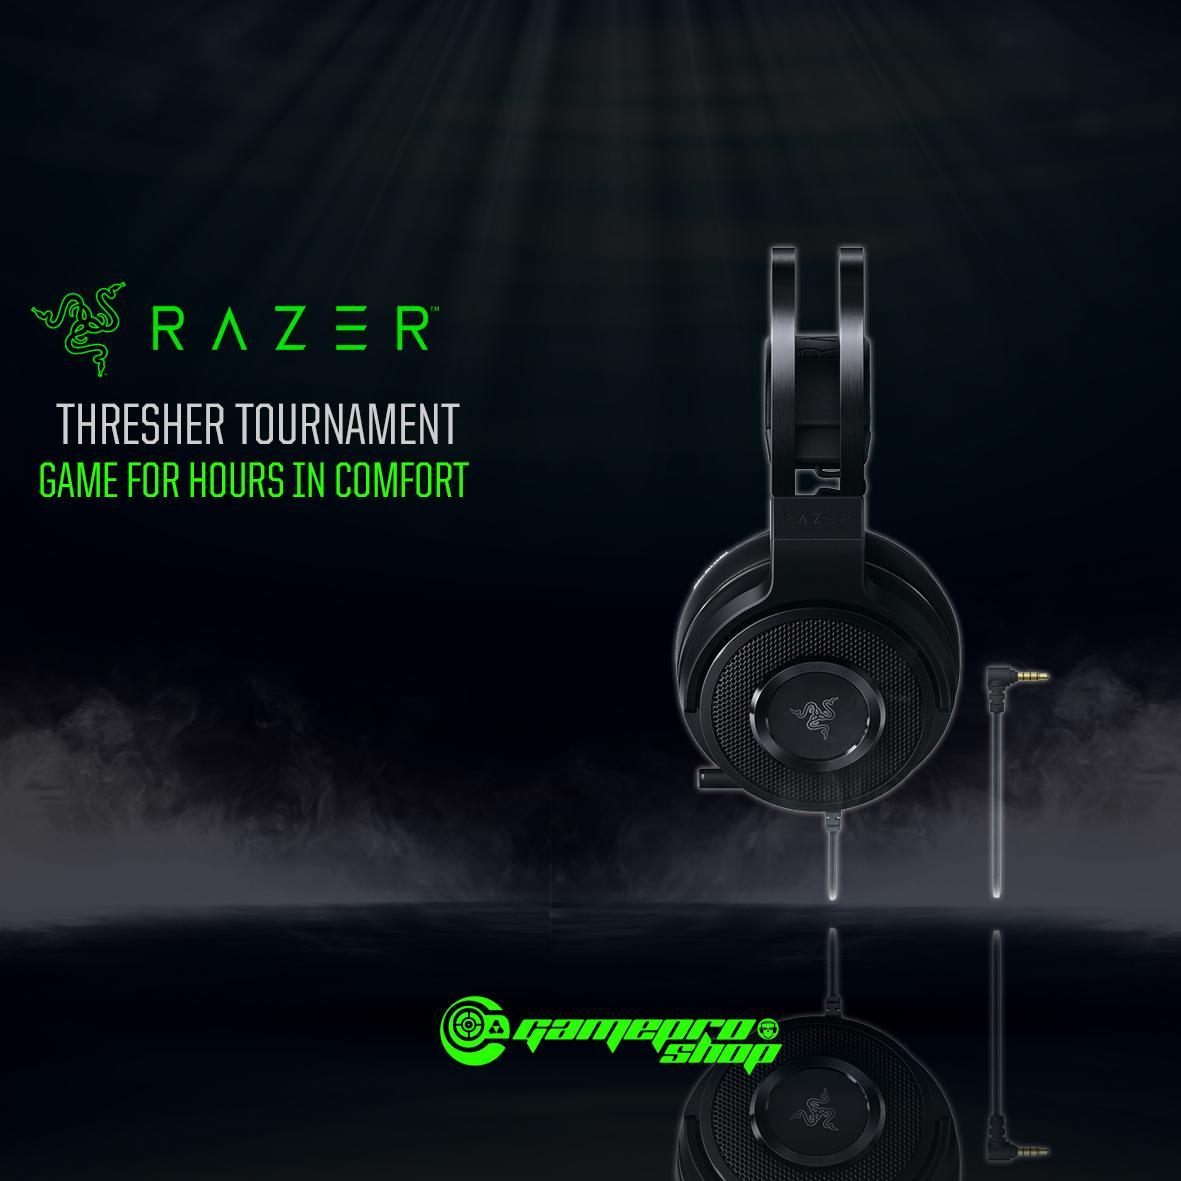 6e59bdf14dd Razer Thresher Tournament Wired Gaming Headset *gss Promo* By Gameprosg  (capitaland Merchant)